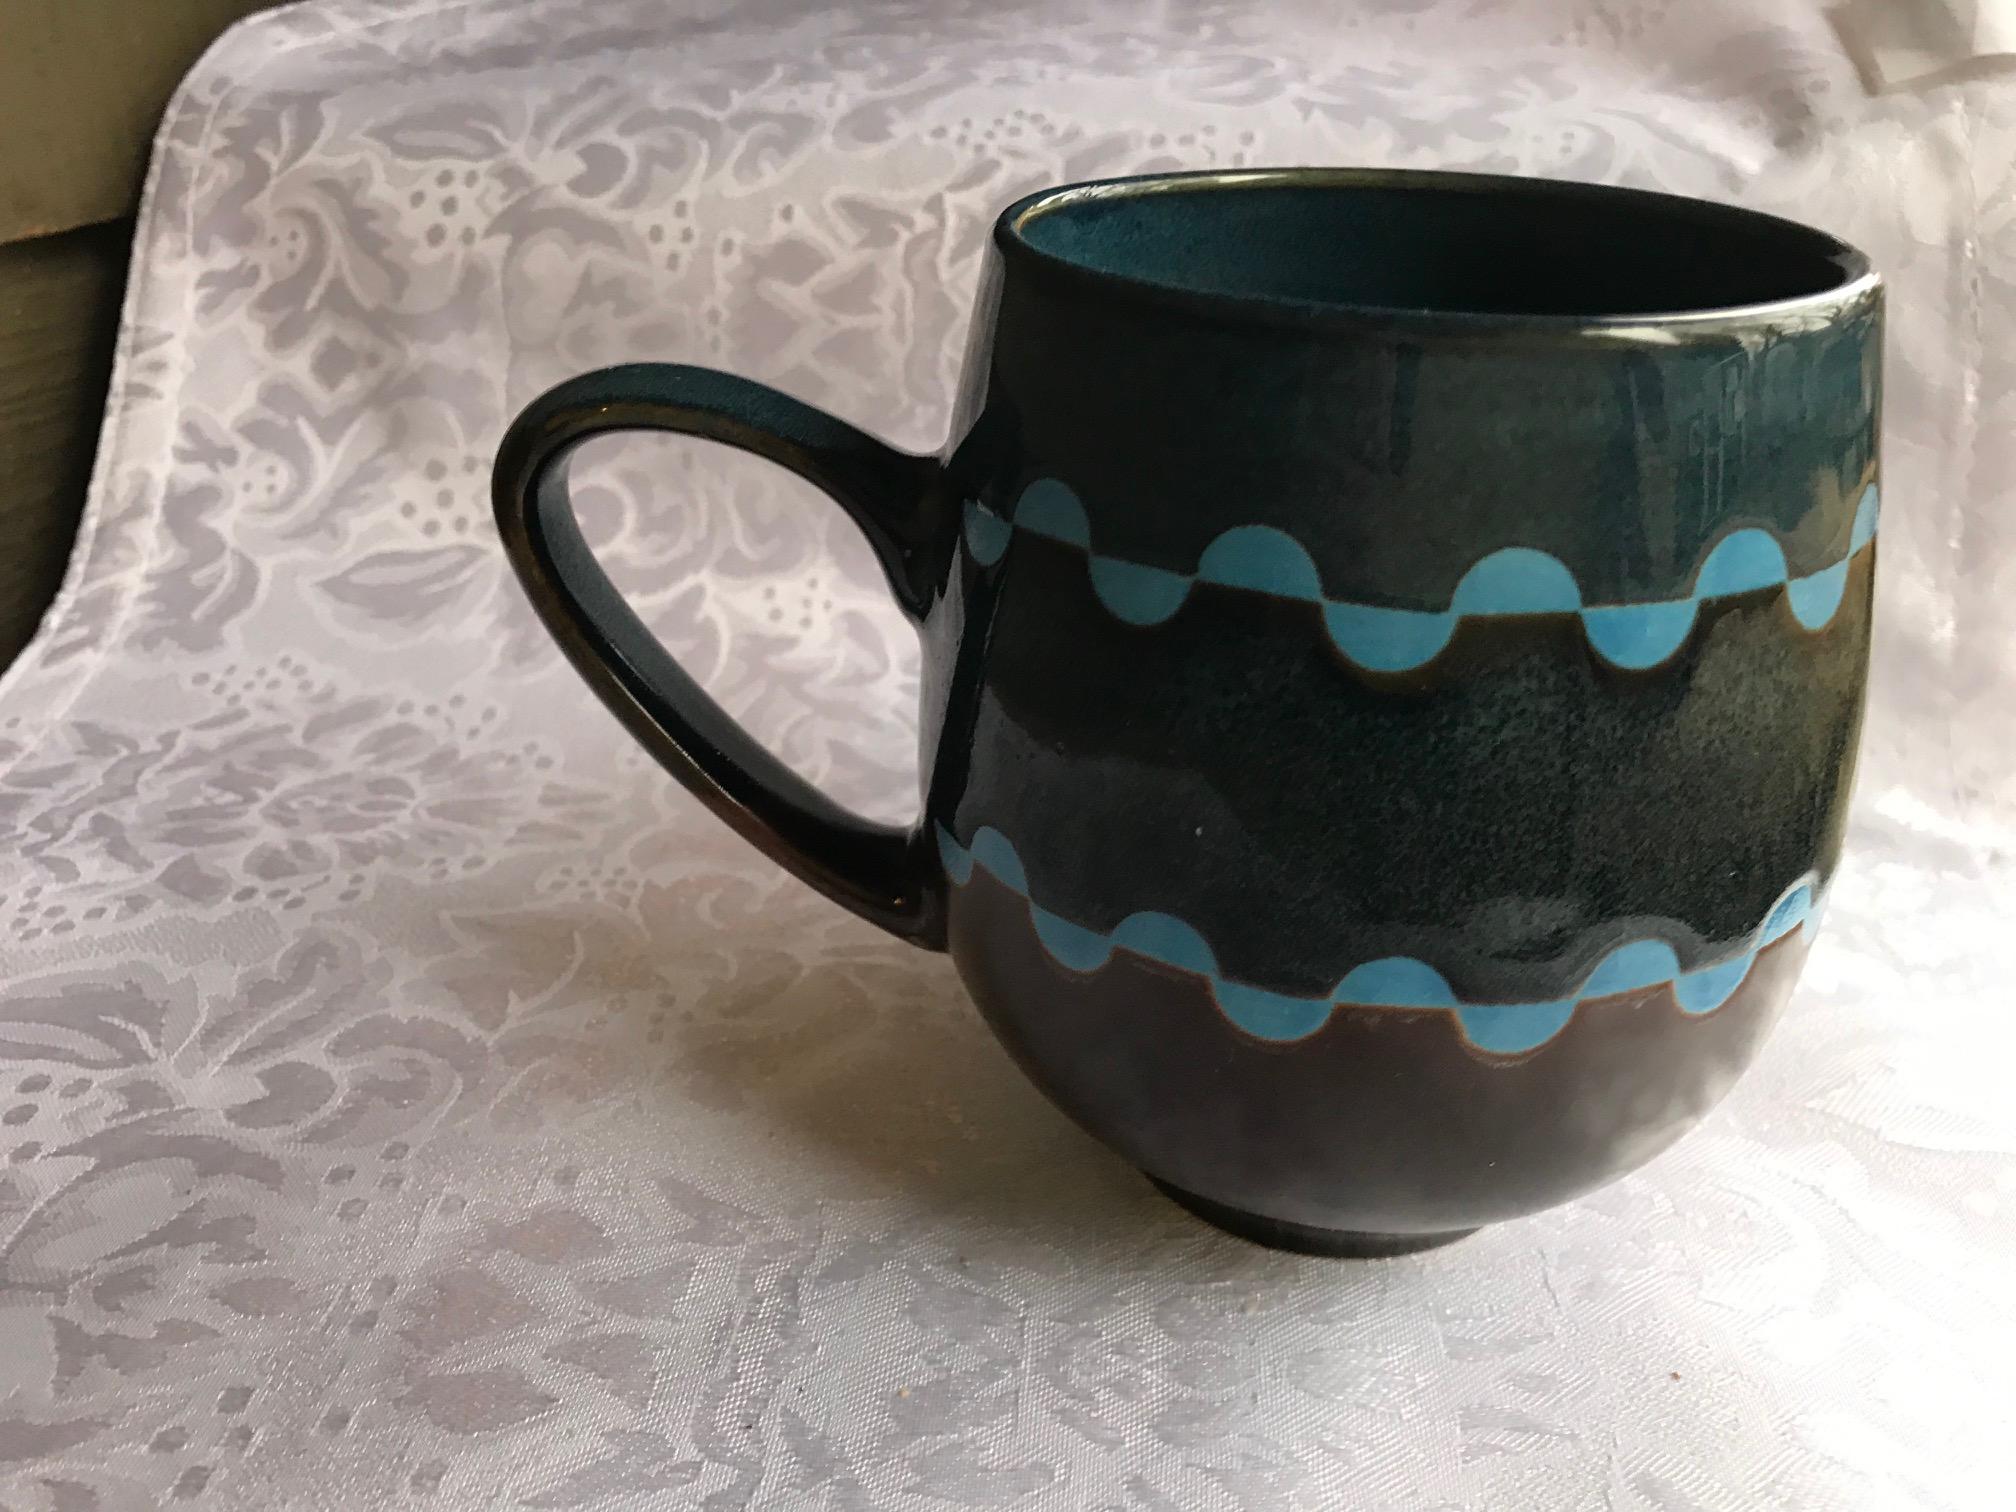 Dema Designs Romsey Brown and Blue Ceramic Mug: 29 ppm Lead (Lead-Safe)